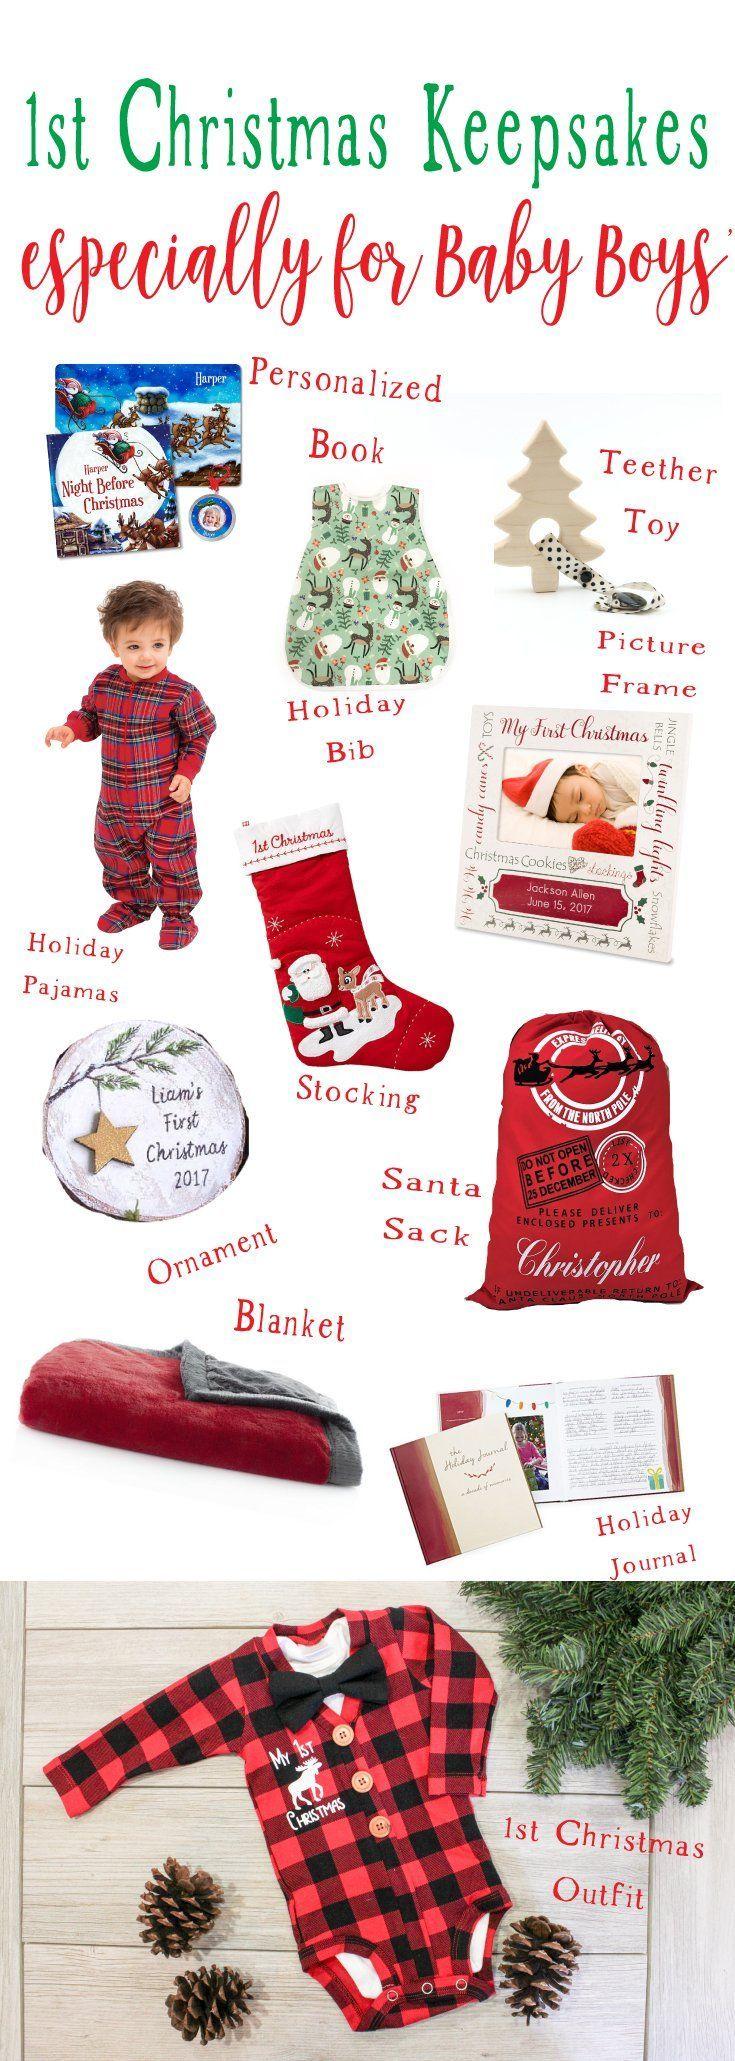 Baby Boy 1st Christmas Keepsake Ideas   Christmas   Baby christmas gifts, Christmas gifts for ...